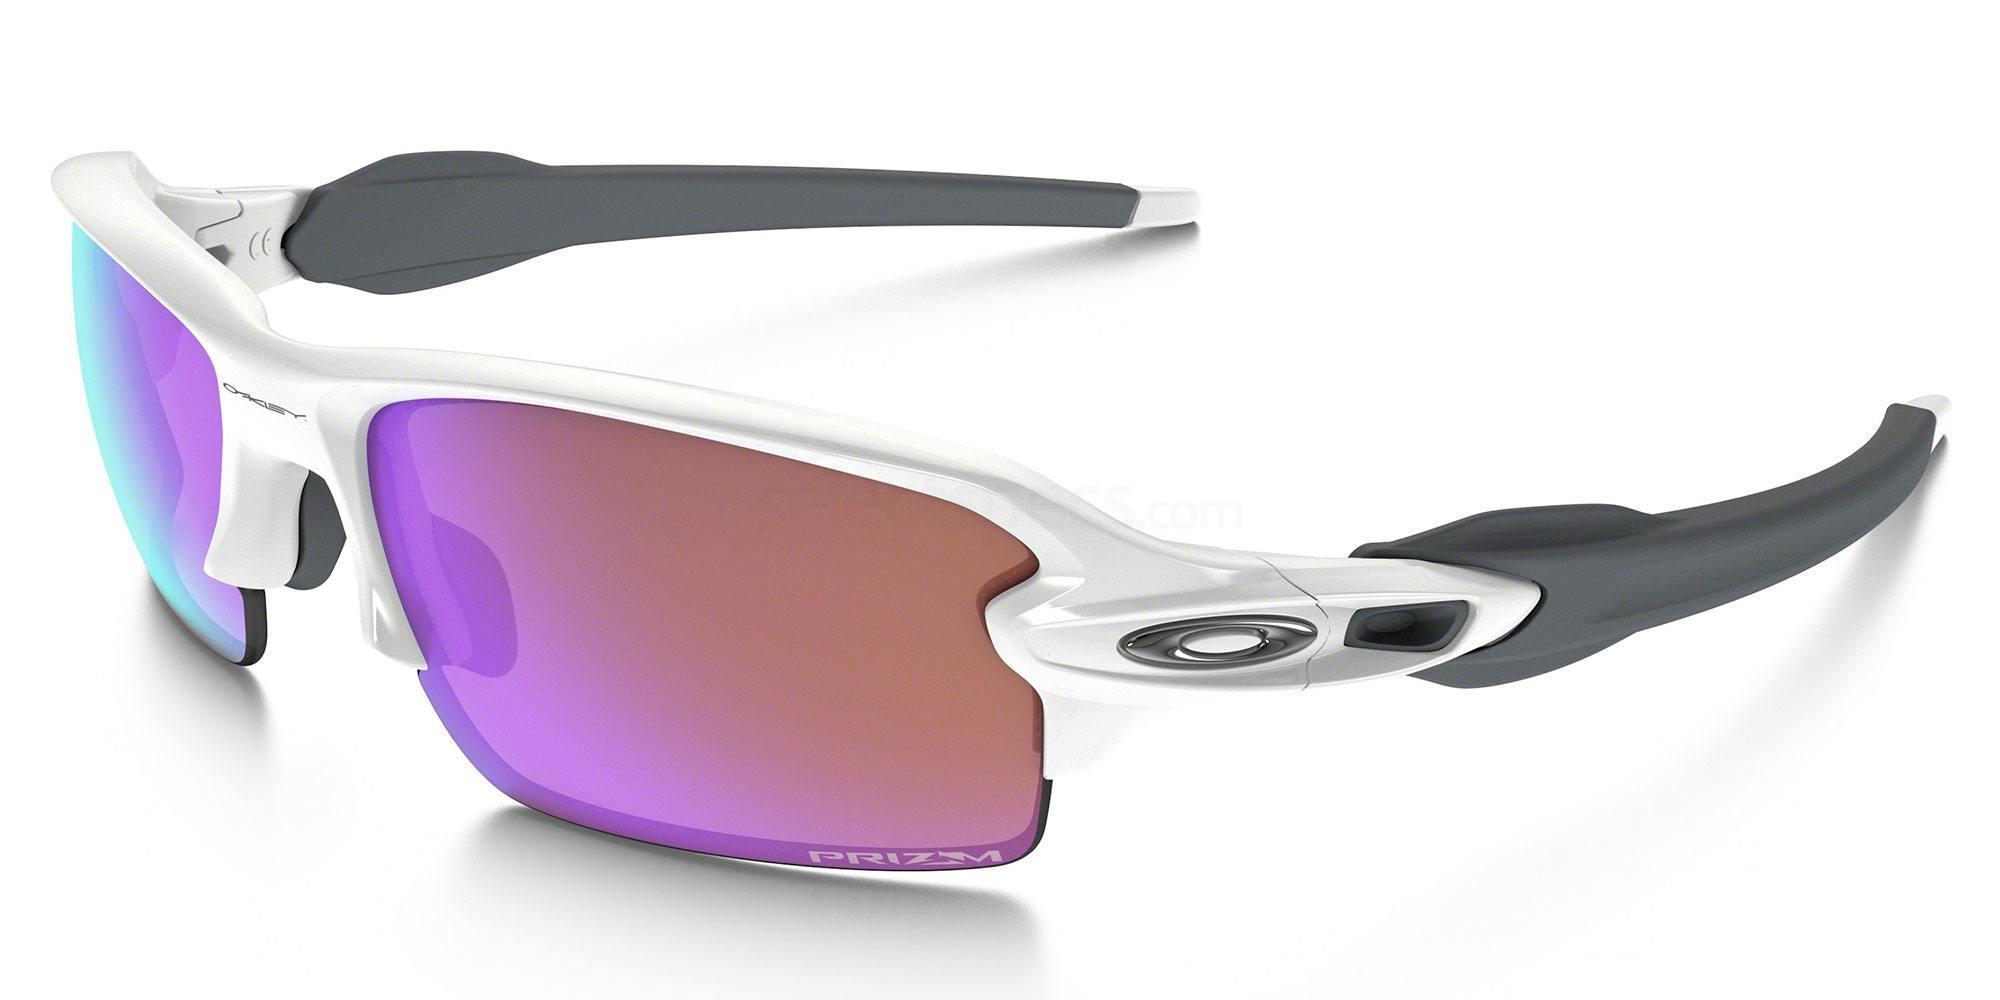 929506 OO9295 PRIZM GOLF FLAK 2.0 Sunglasses, Oakley